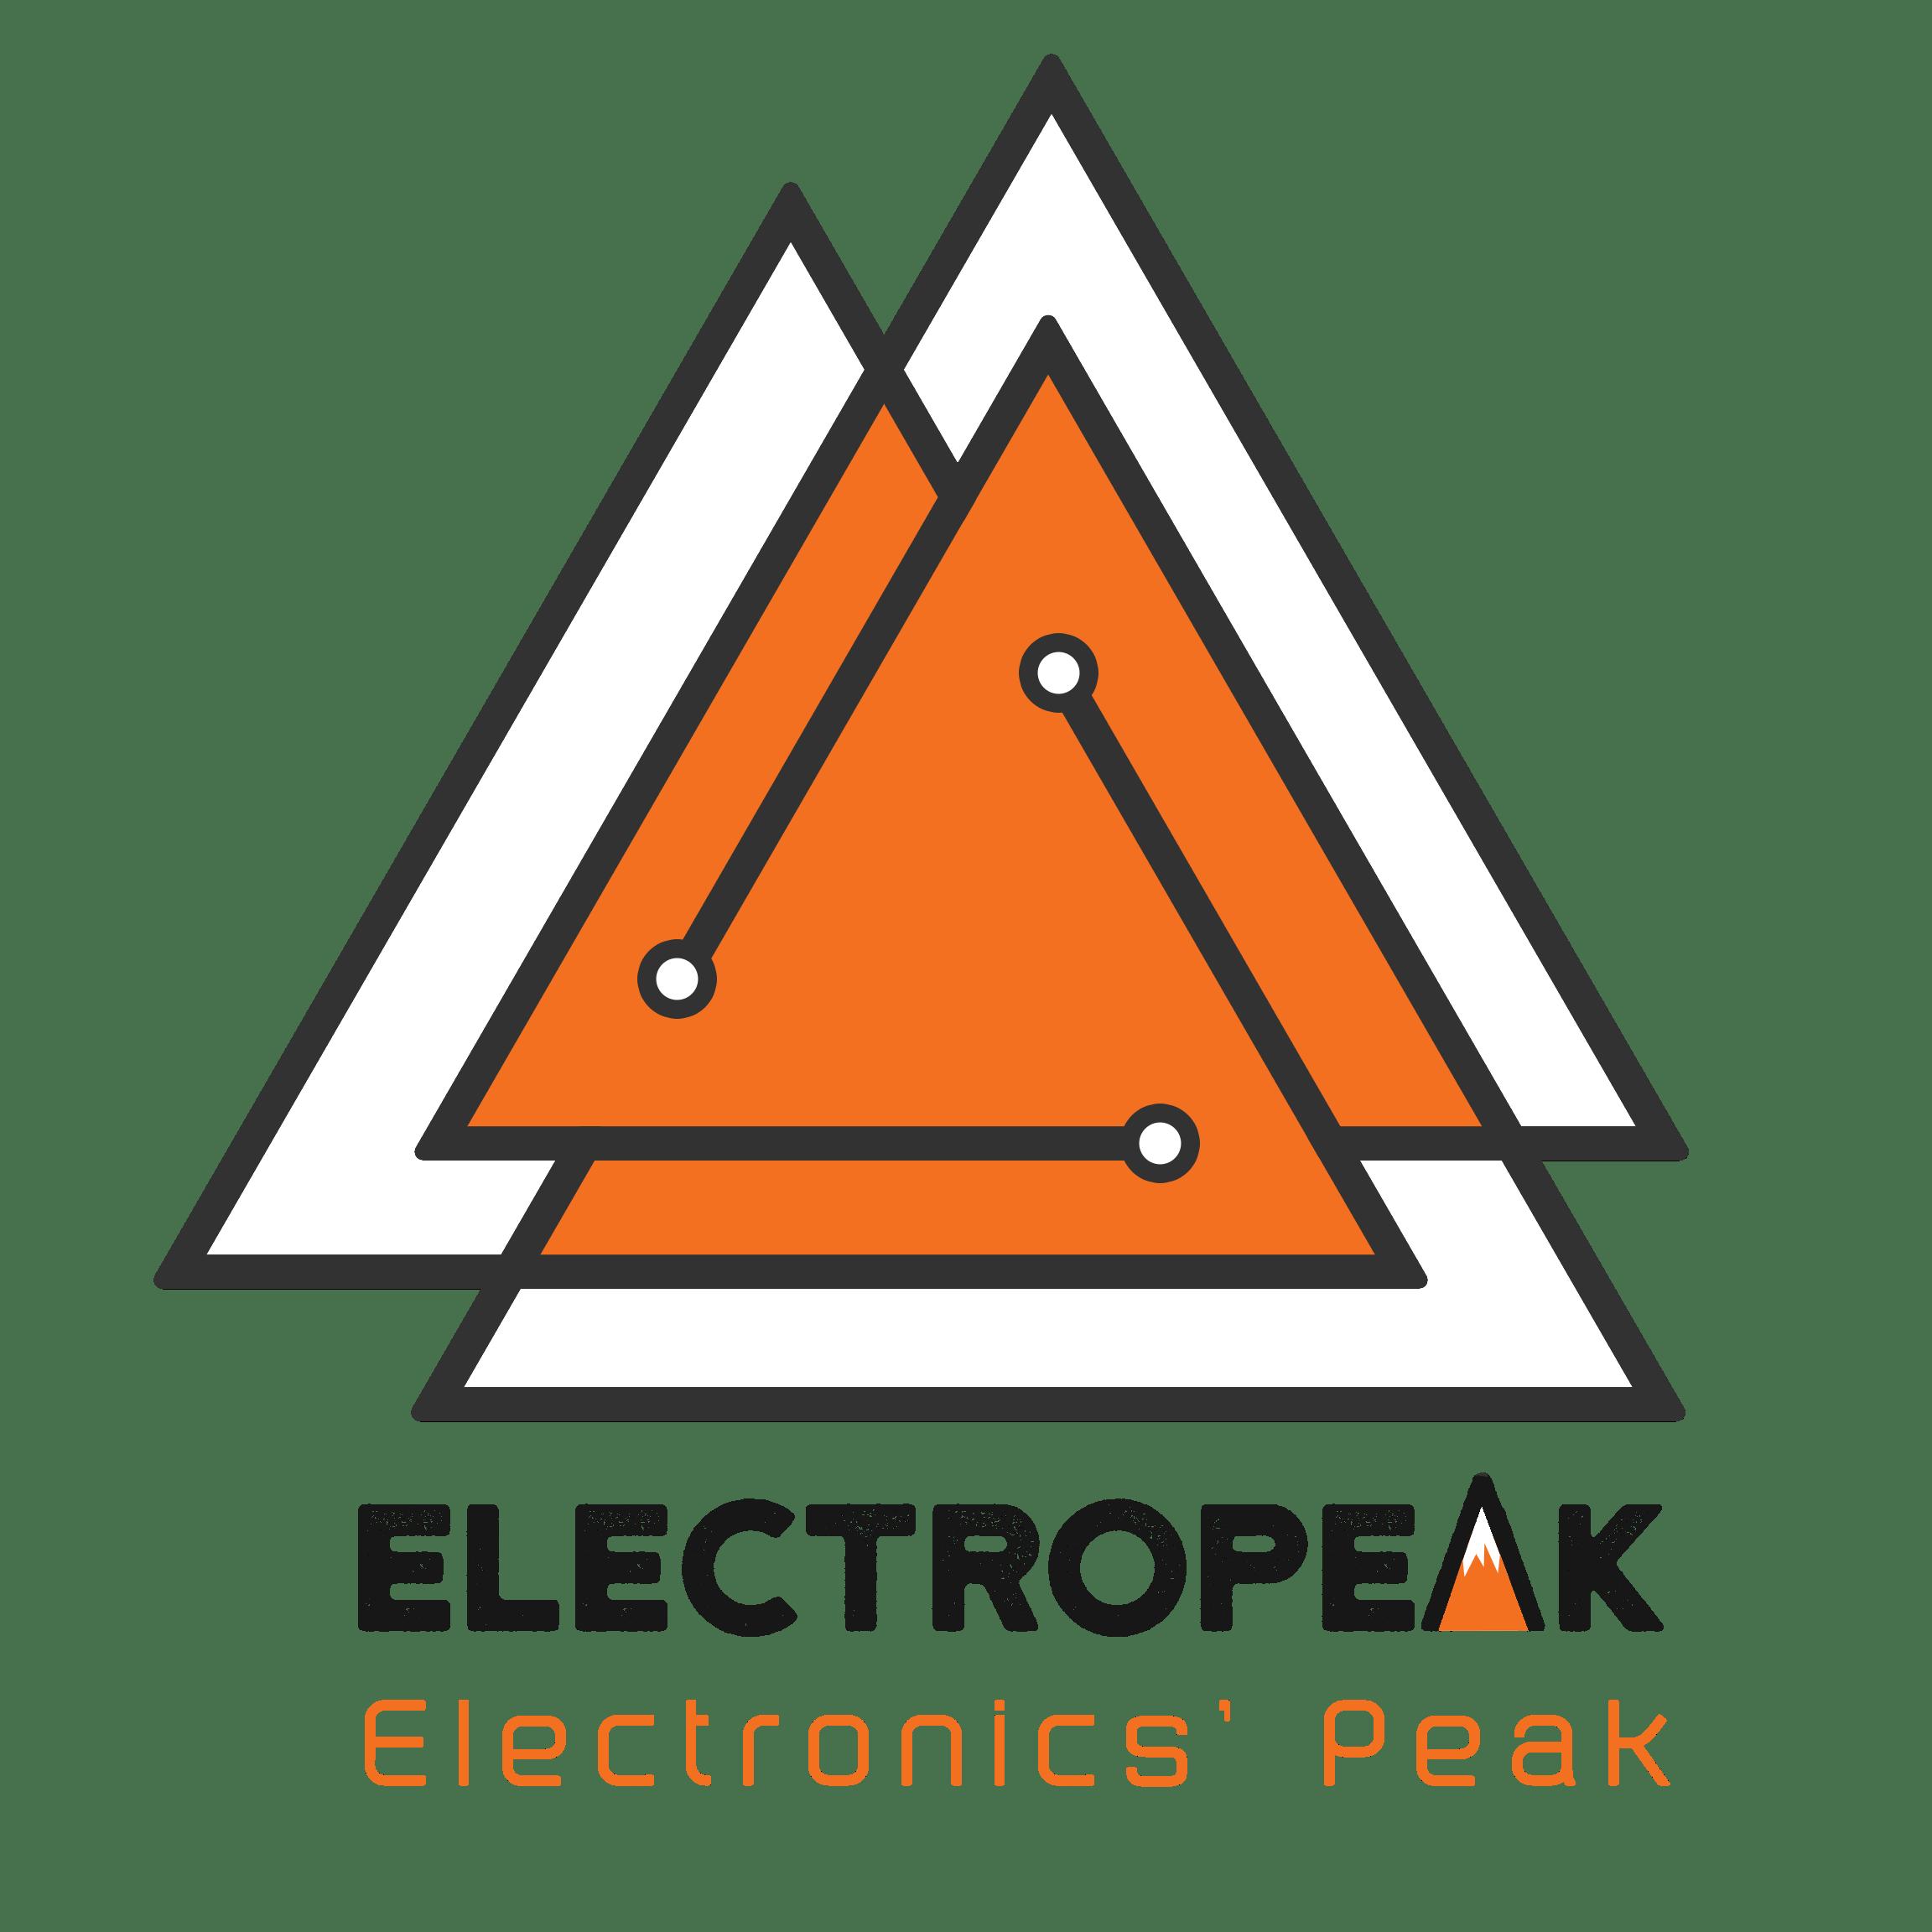 ElectroPeak